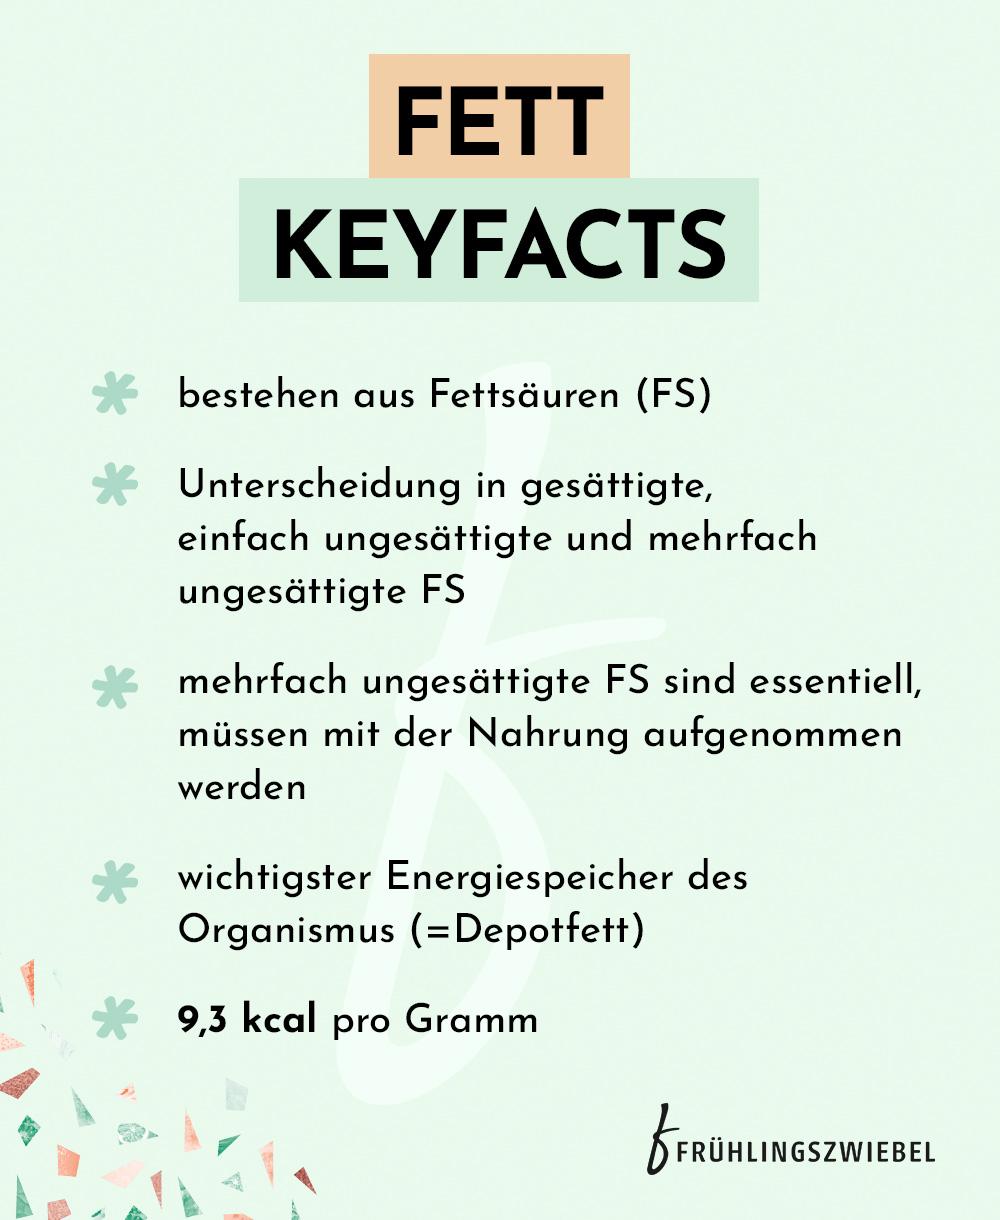 Fett Keyfacts